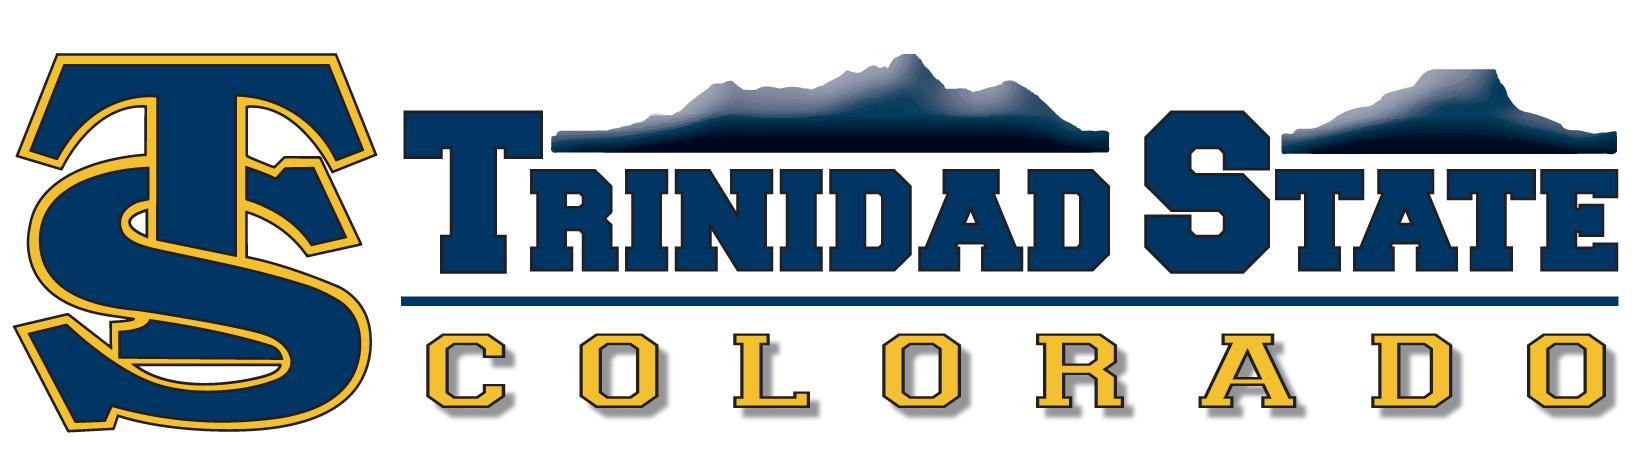 TrinidadStateJrCollege.jpg